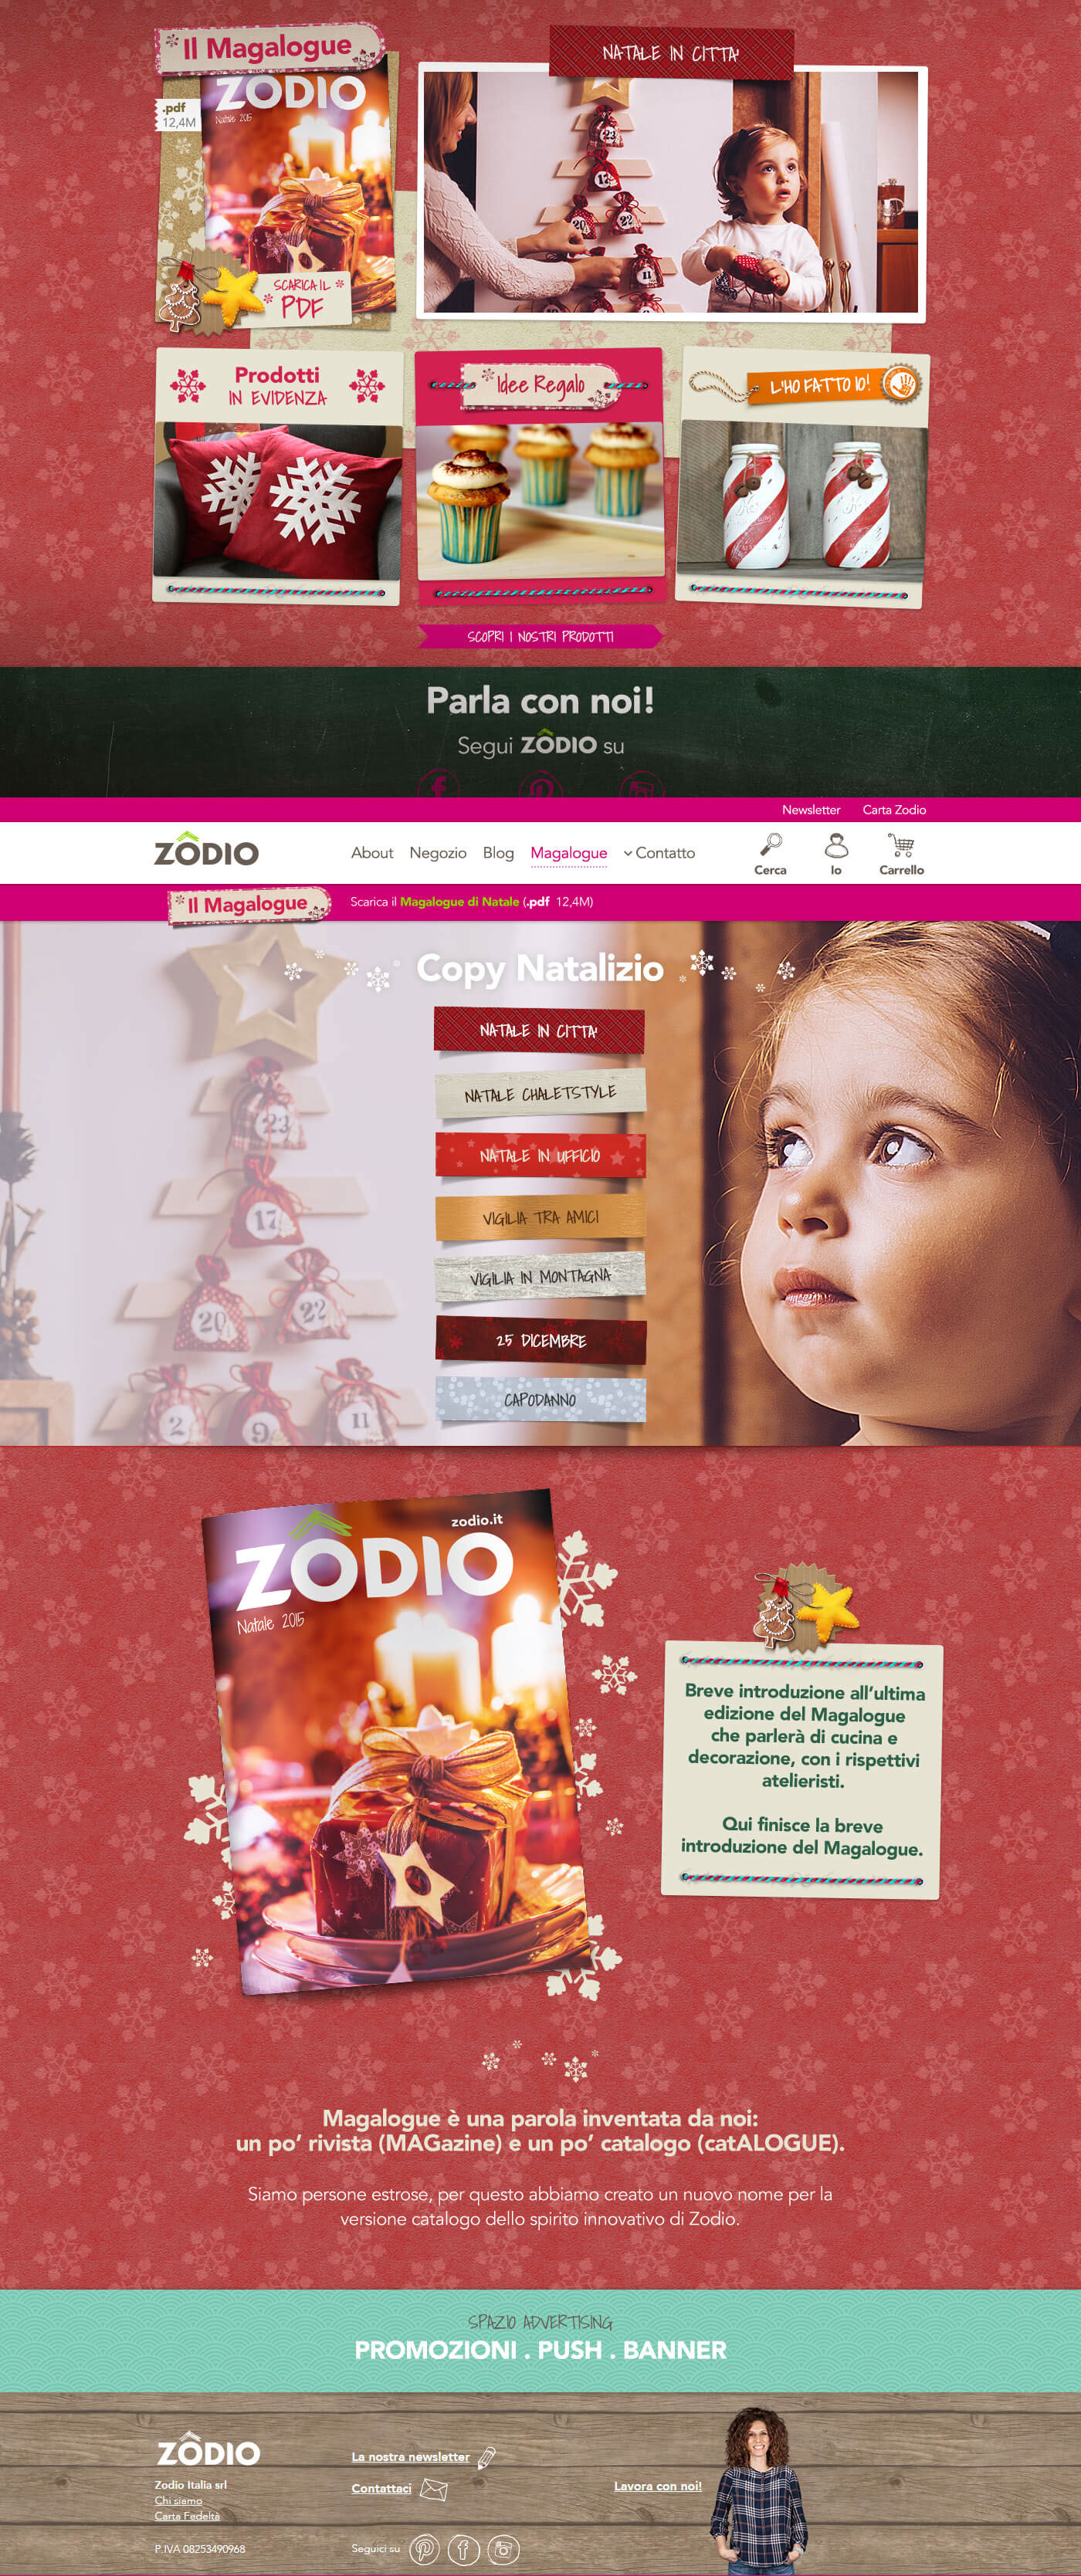 ux/ui,visual design,e-commerce,zodio,crafting,magalogue,Catalogue